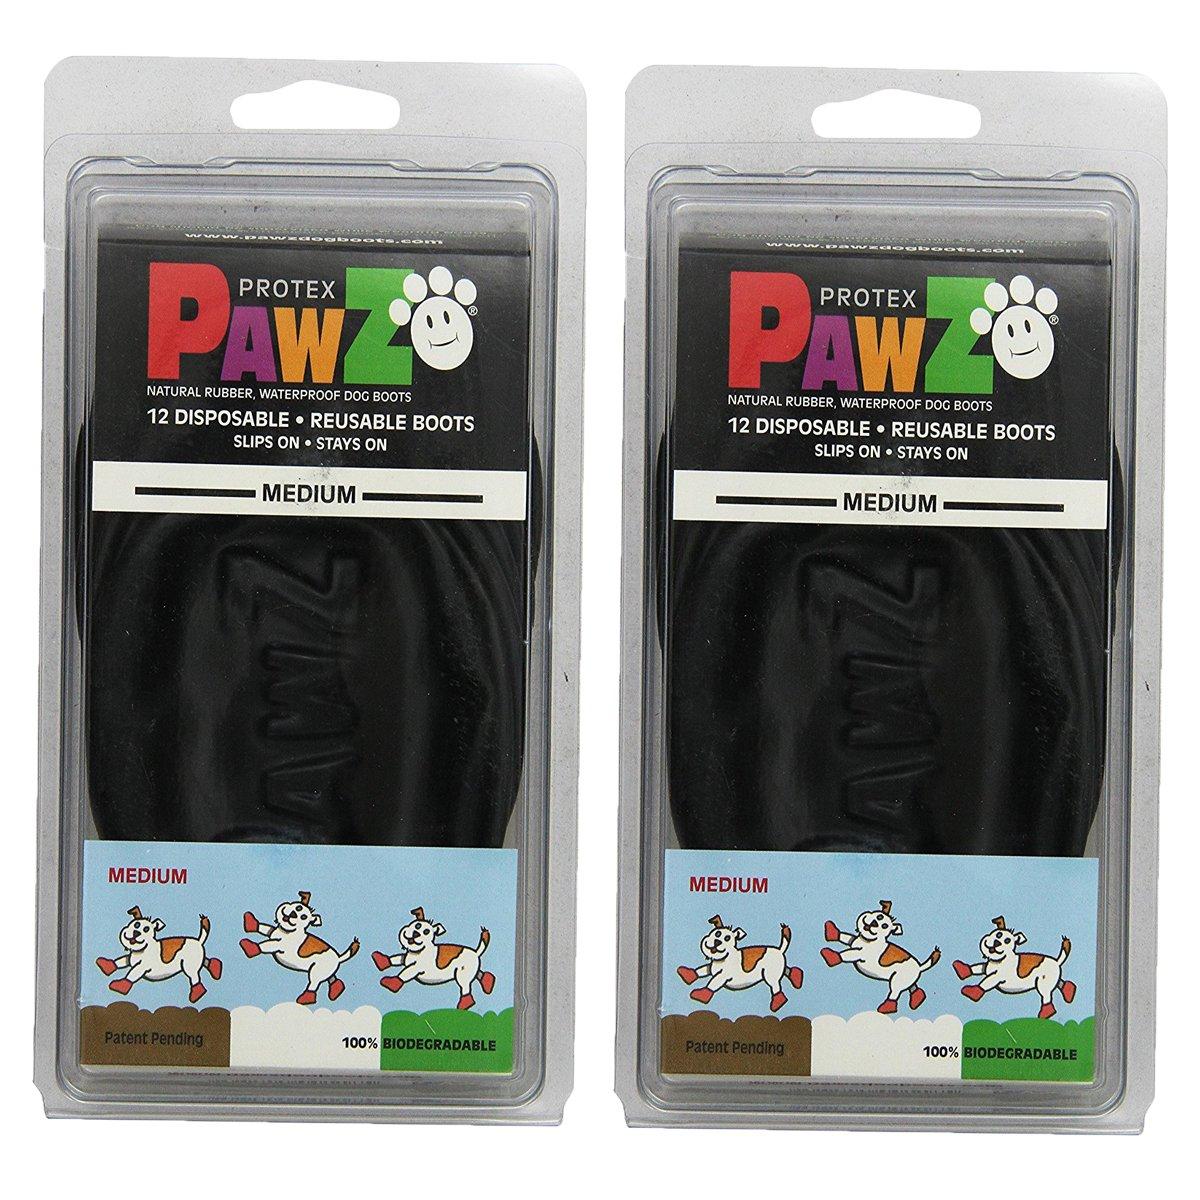 Pawz Water-Proof Dog Boot, Black, Medium (2 Pack)